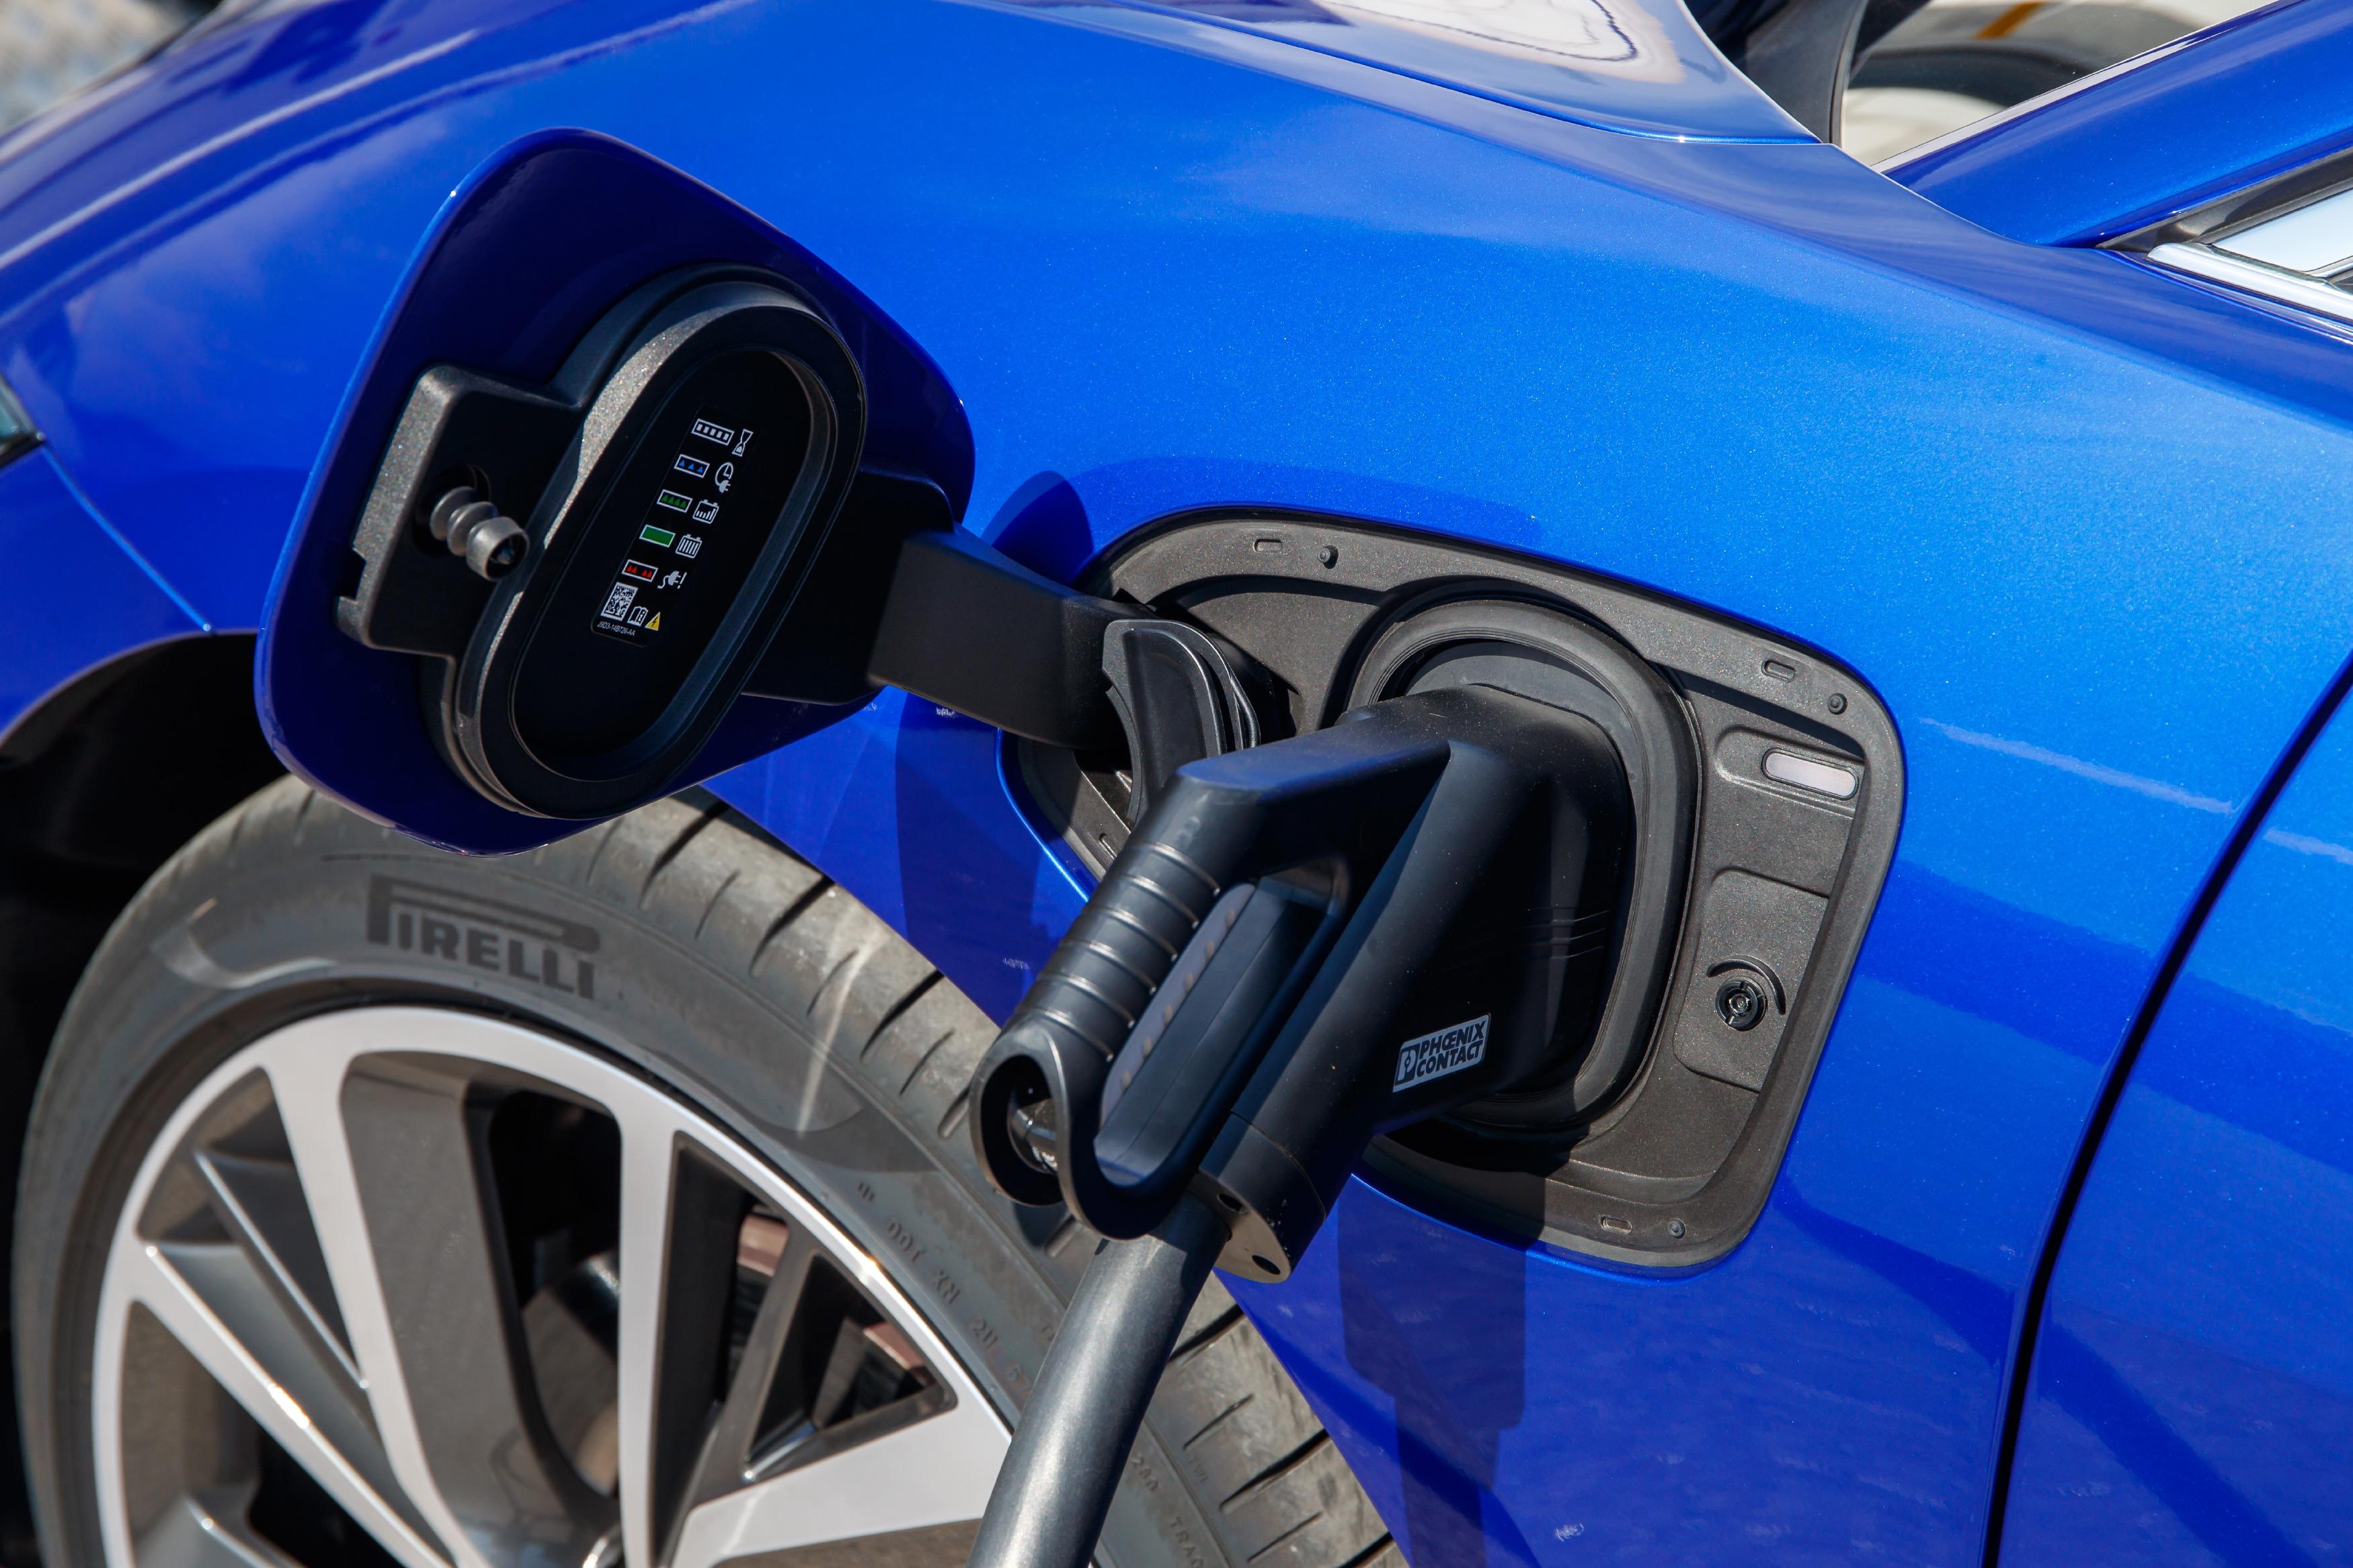 Jaguar I-PACE charging